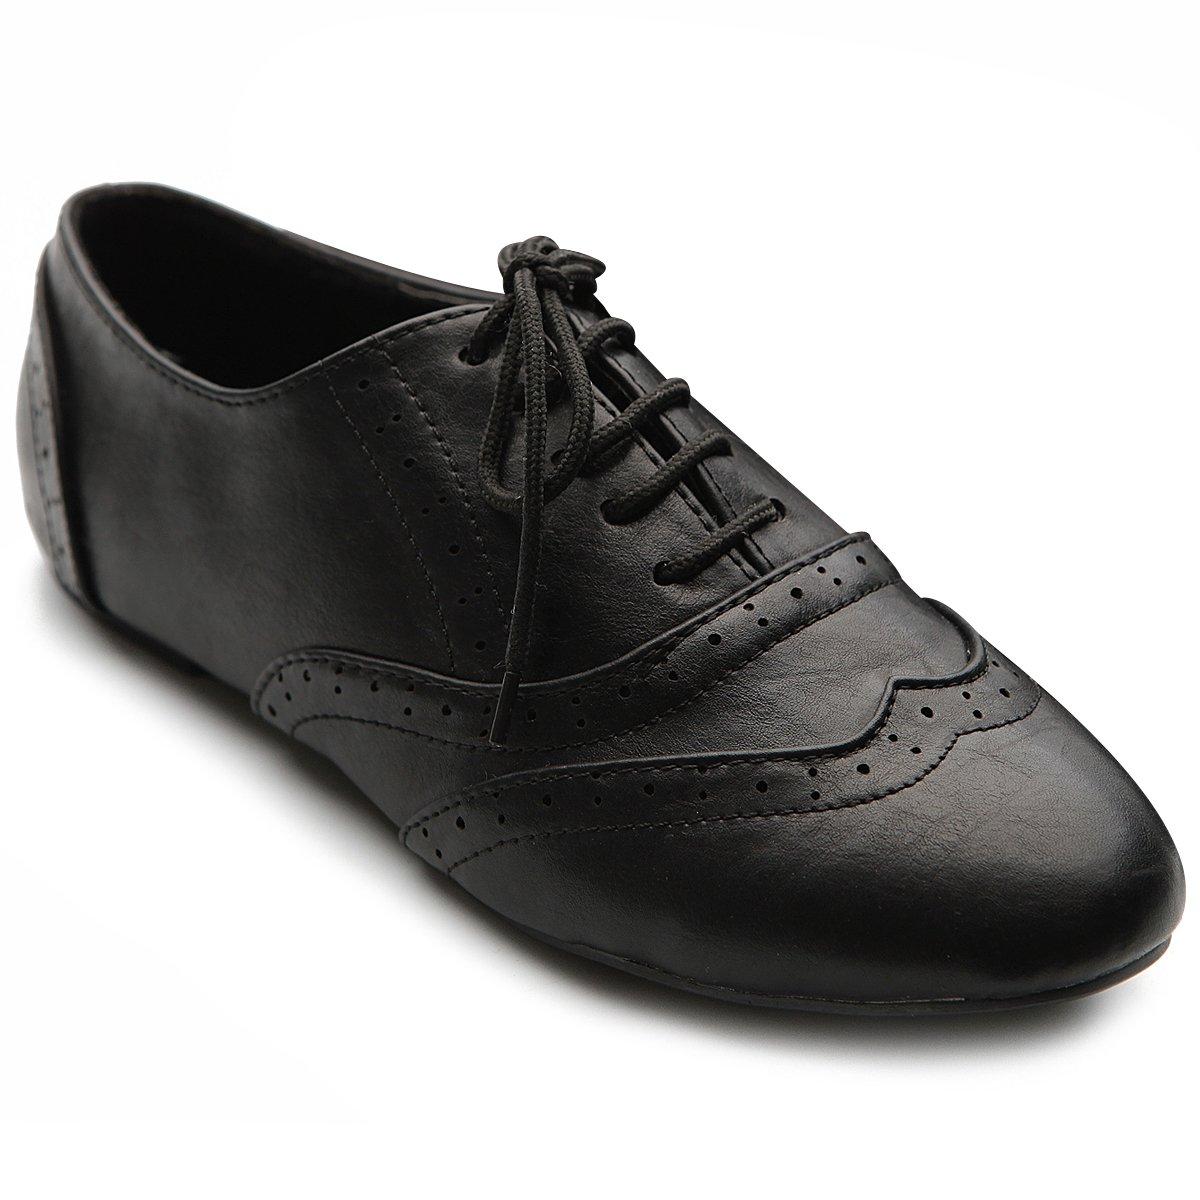 Ollio Women's Shoe Classic Lace up Dress Low Flat Heel Oxford M1914(8.5 B(M) US, Black)